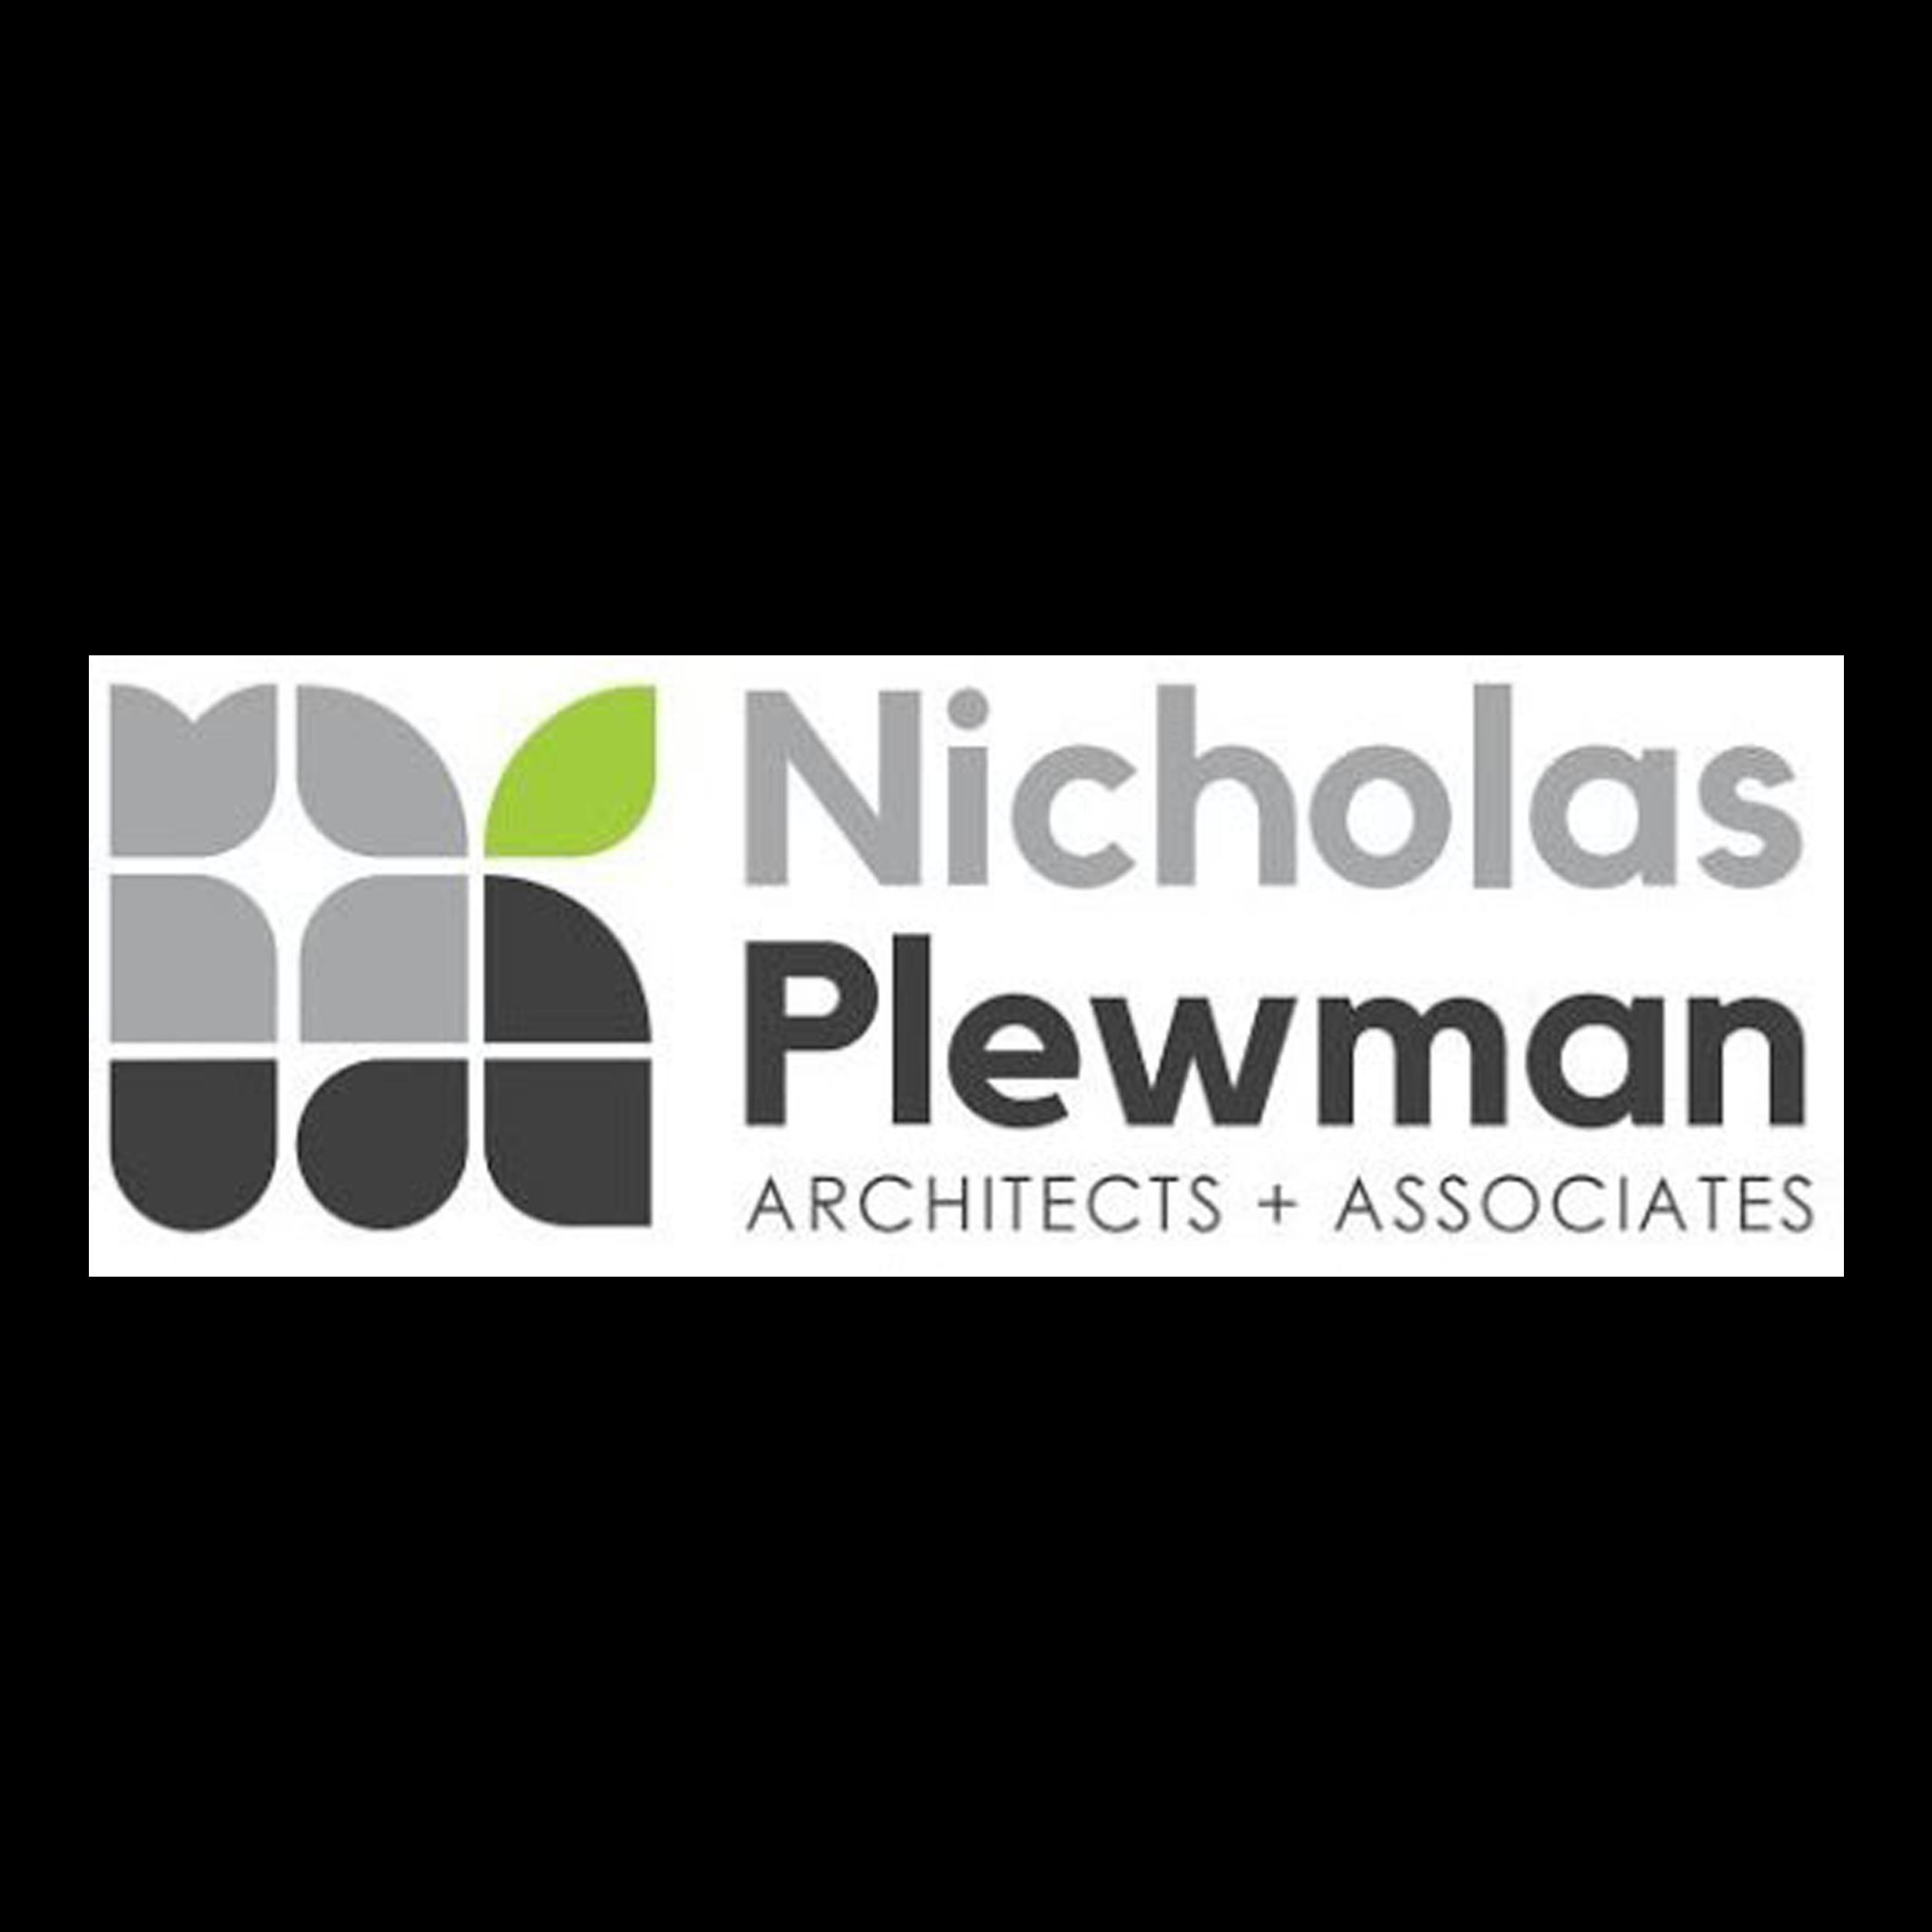 Nicholas Plewman Architects